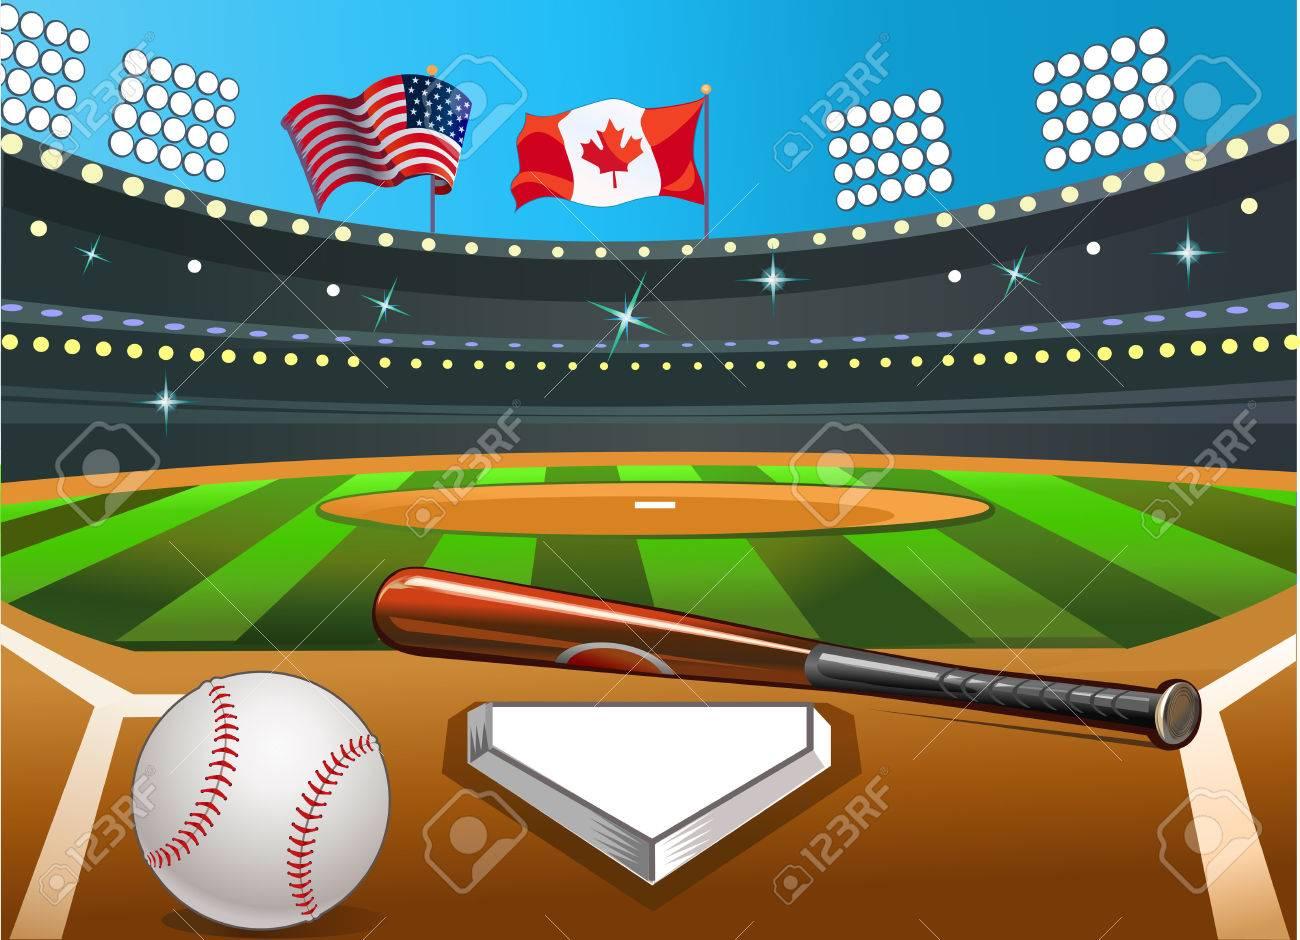 baseball stadium royalty free cliparts vectors and stock rh 123rf com baseball stadium lights clipart baseball field clipart